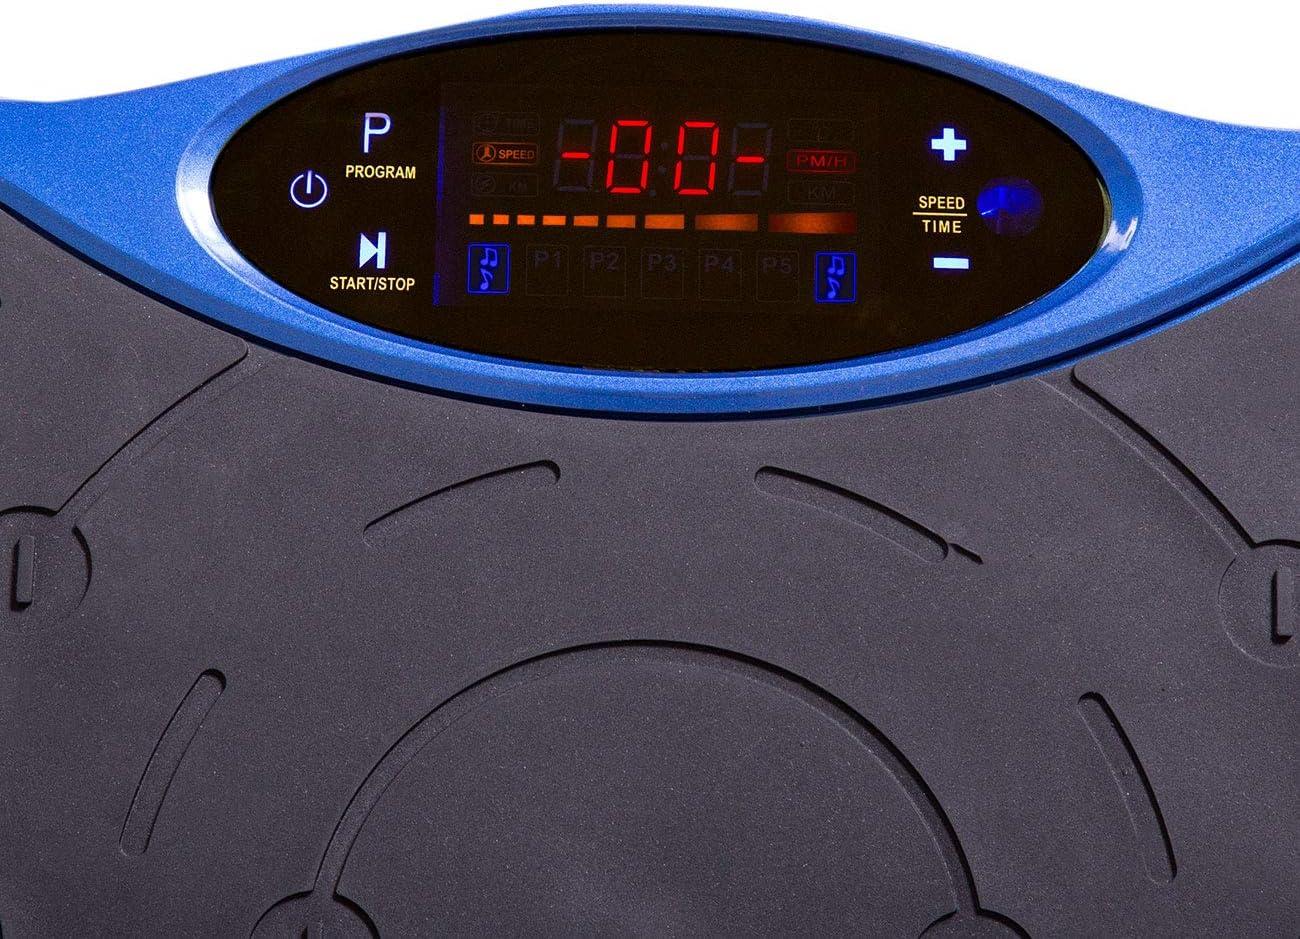 rutschfeste Standfl/äche kompaktes Design Fernbedienung Vibrationstrainer inkl Expanderb/ändern aktivshop Vibrationsplatte